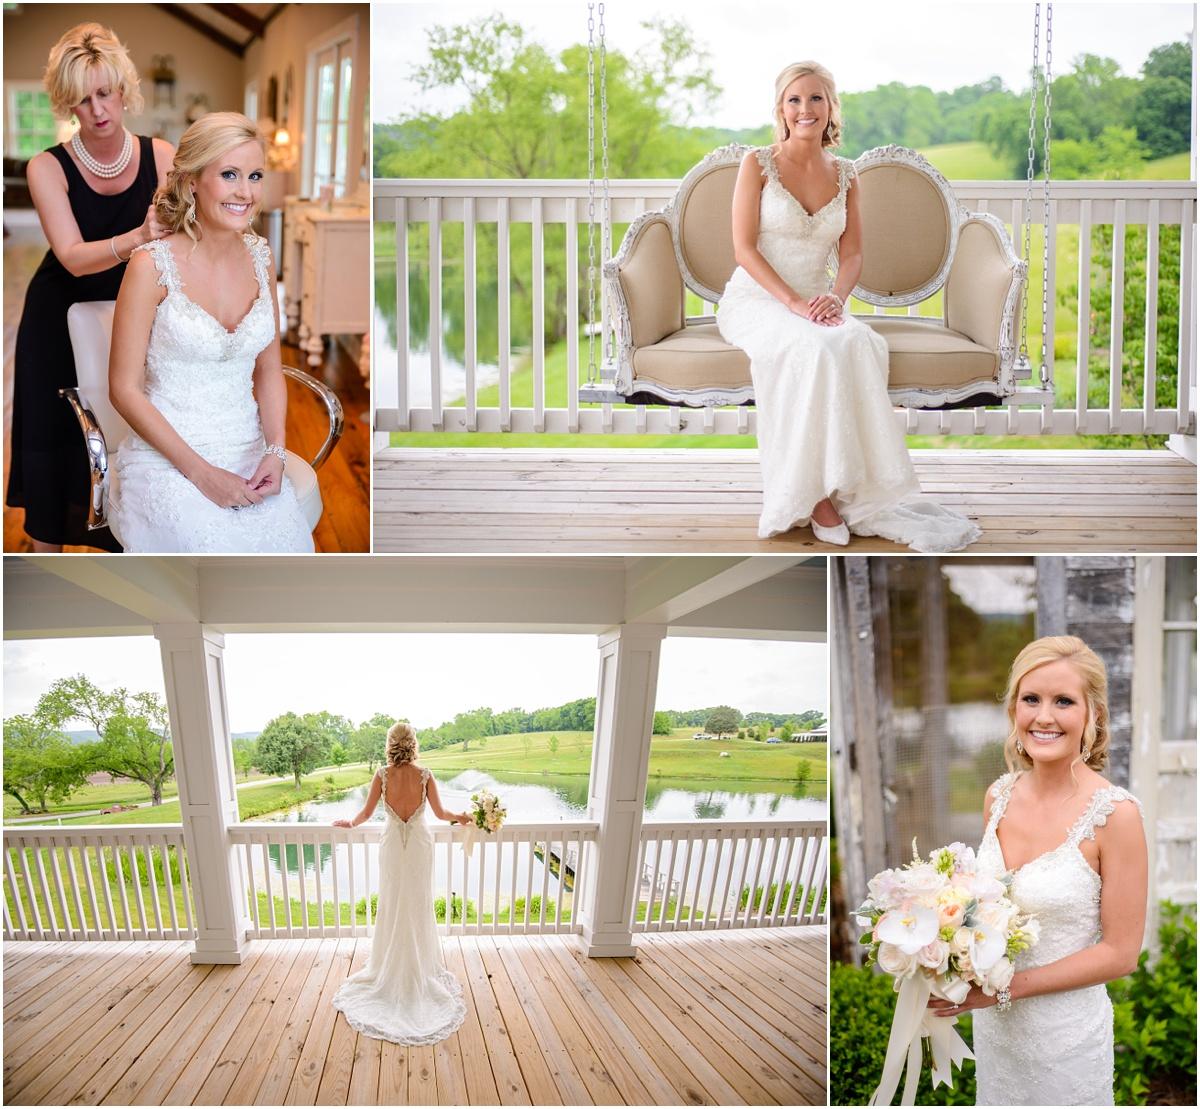 Greg Smit Photography Mint Springs Farm Nashville Tennessee wedding photographer_0359